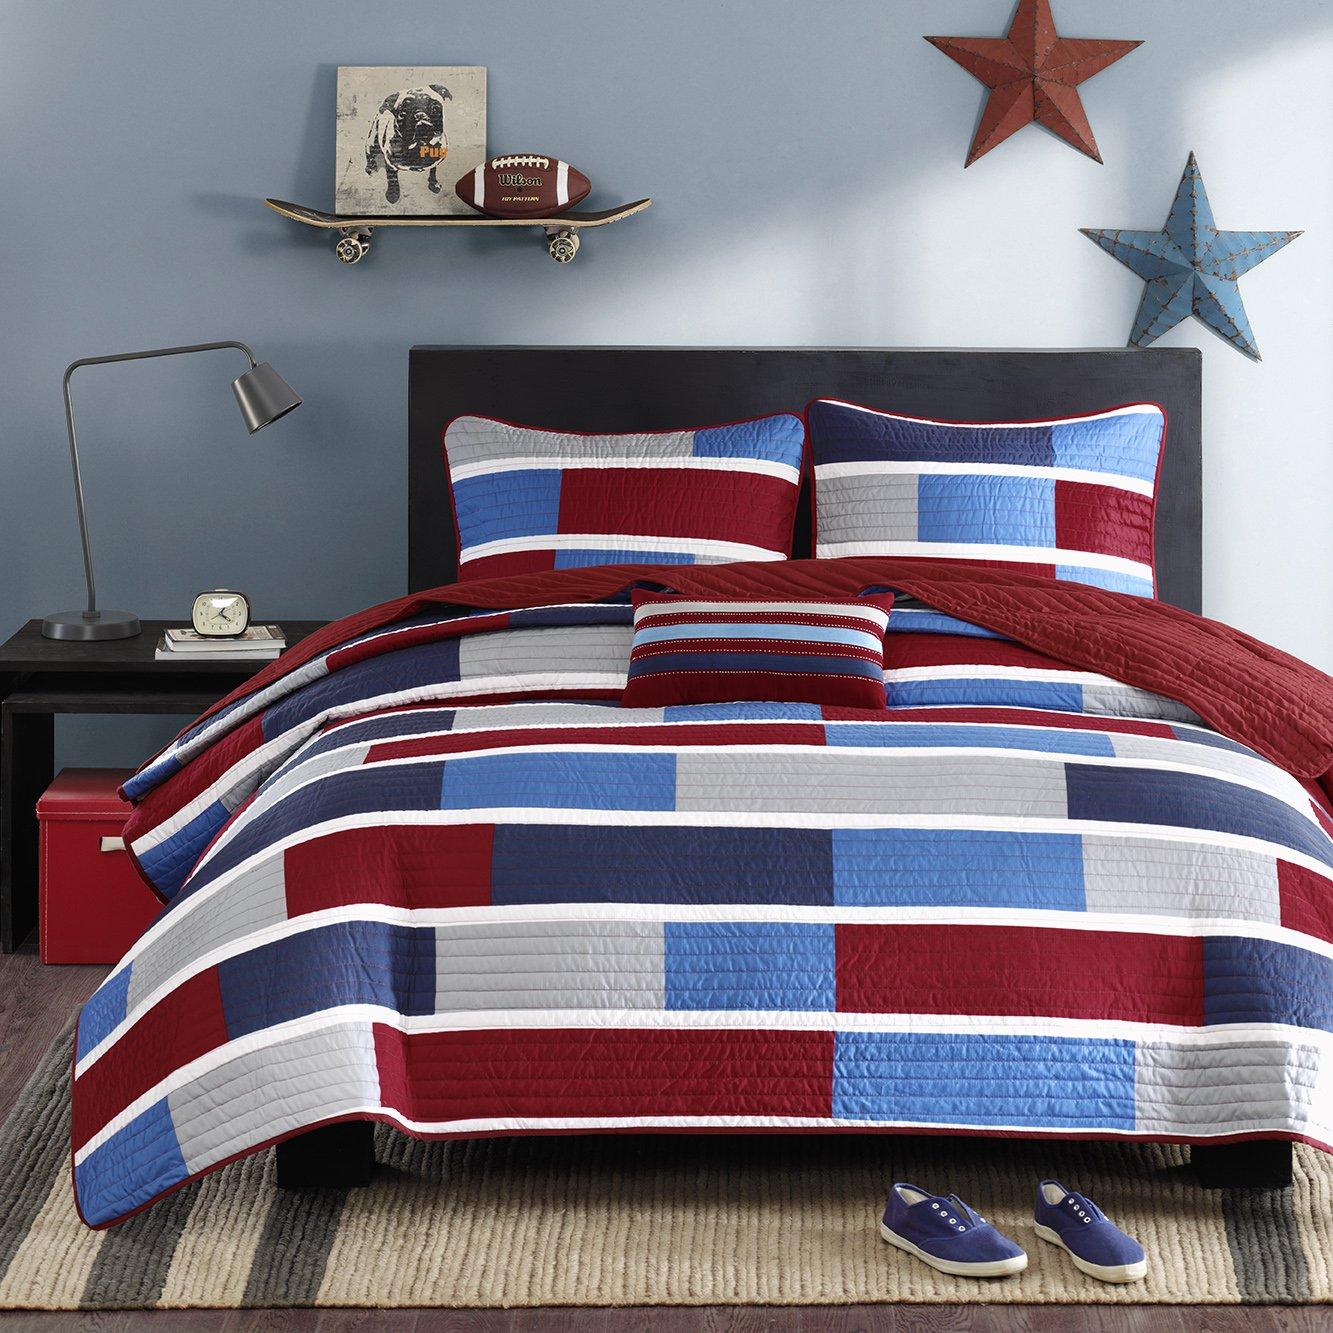 Mizone Bedding Ease Bedding With Style